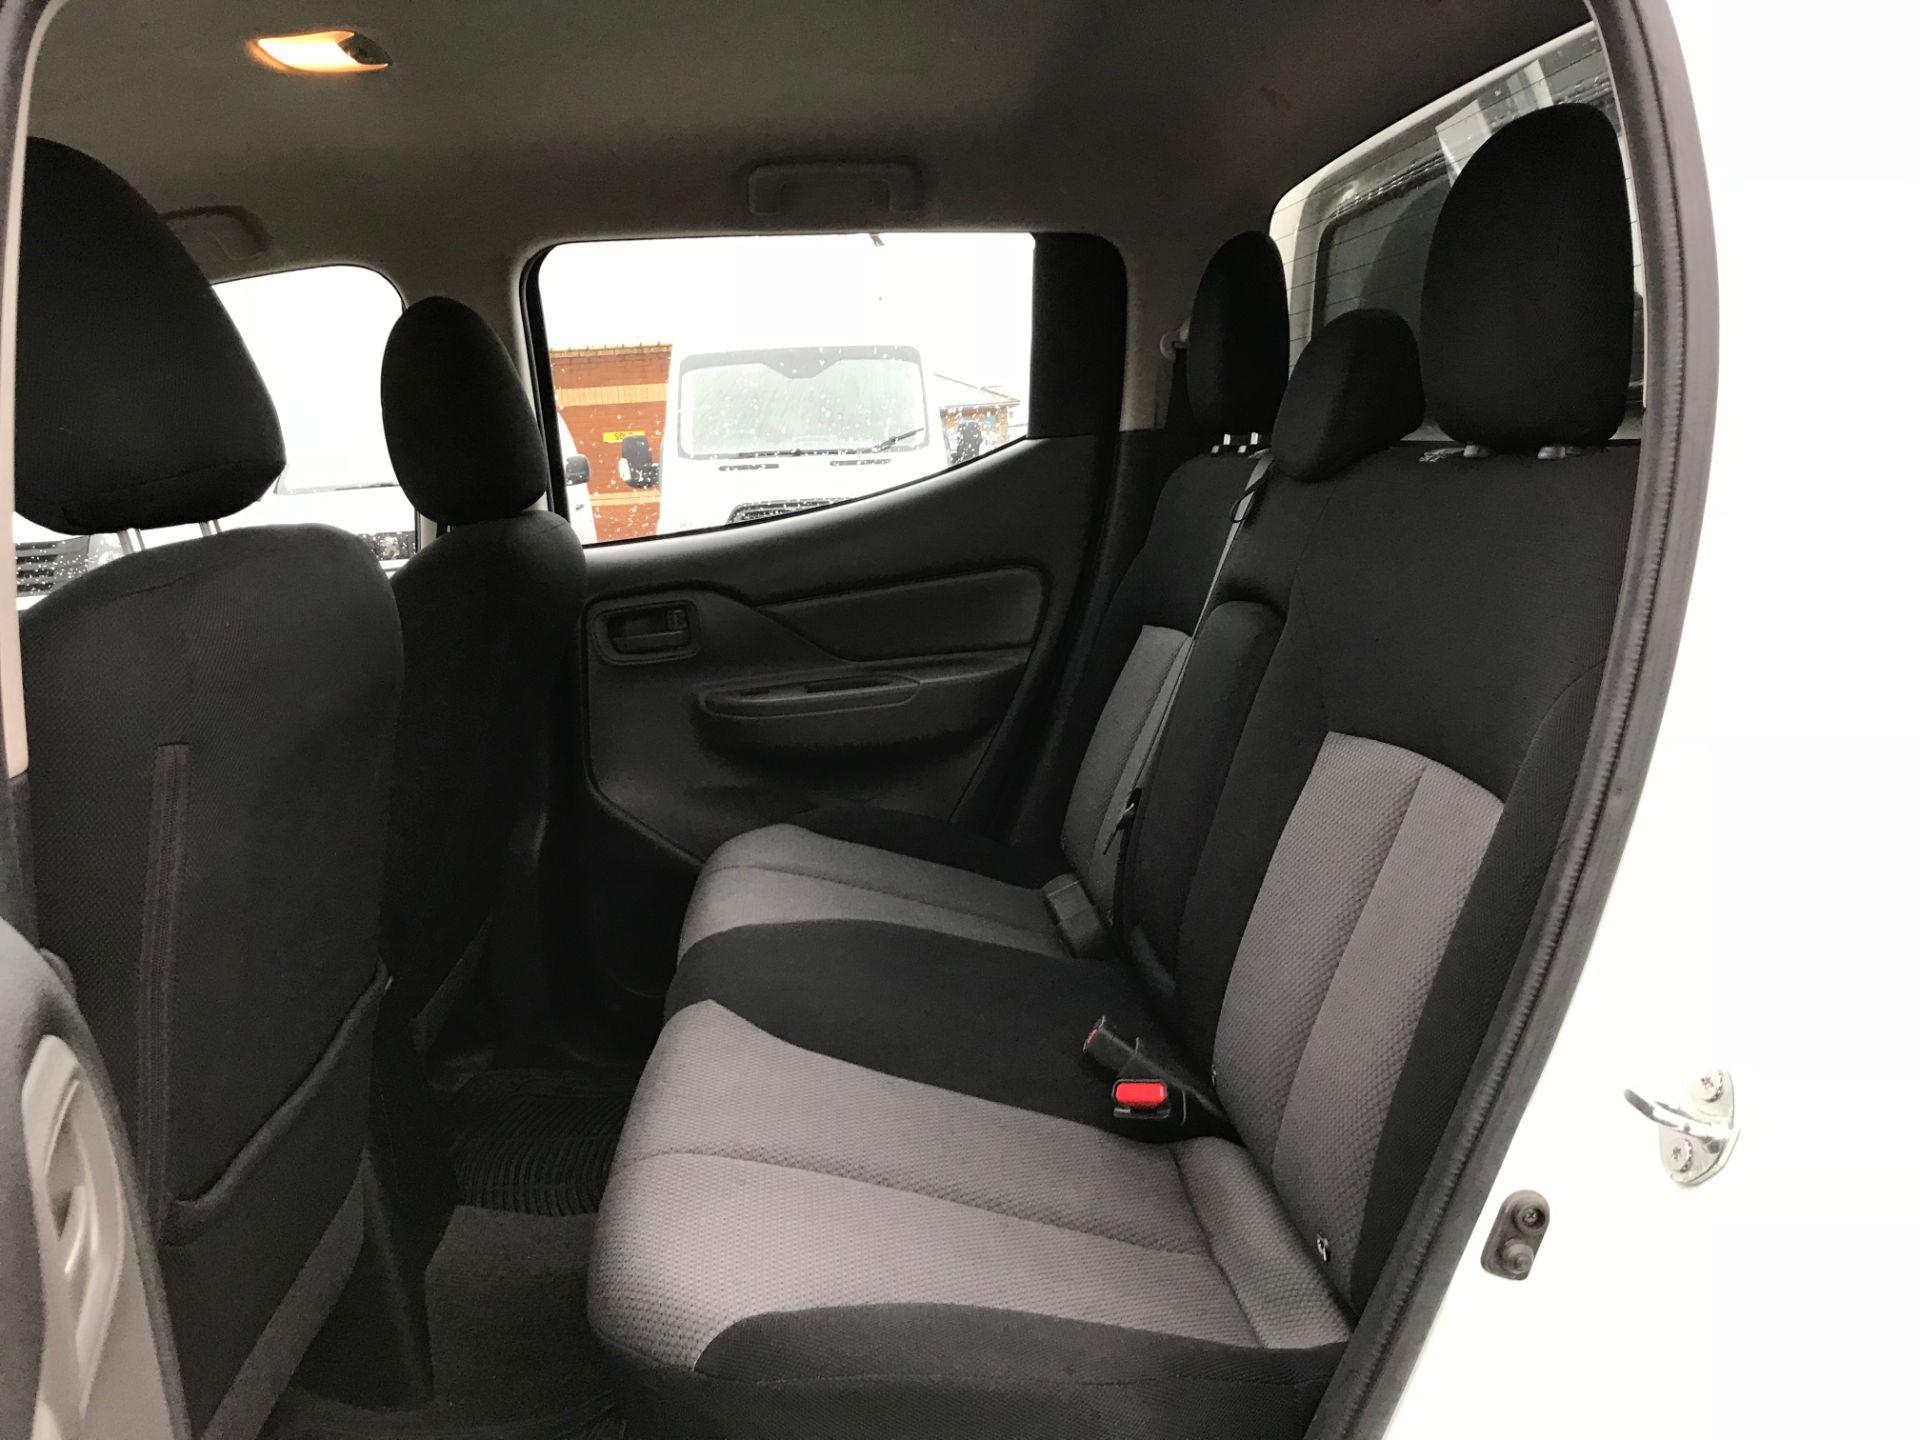 2016 Mitsubishi L200 Double Cab Di-D 151 4Life 4Wd (DV66VPT) Image 16